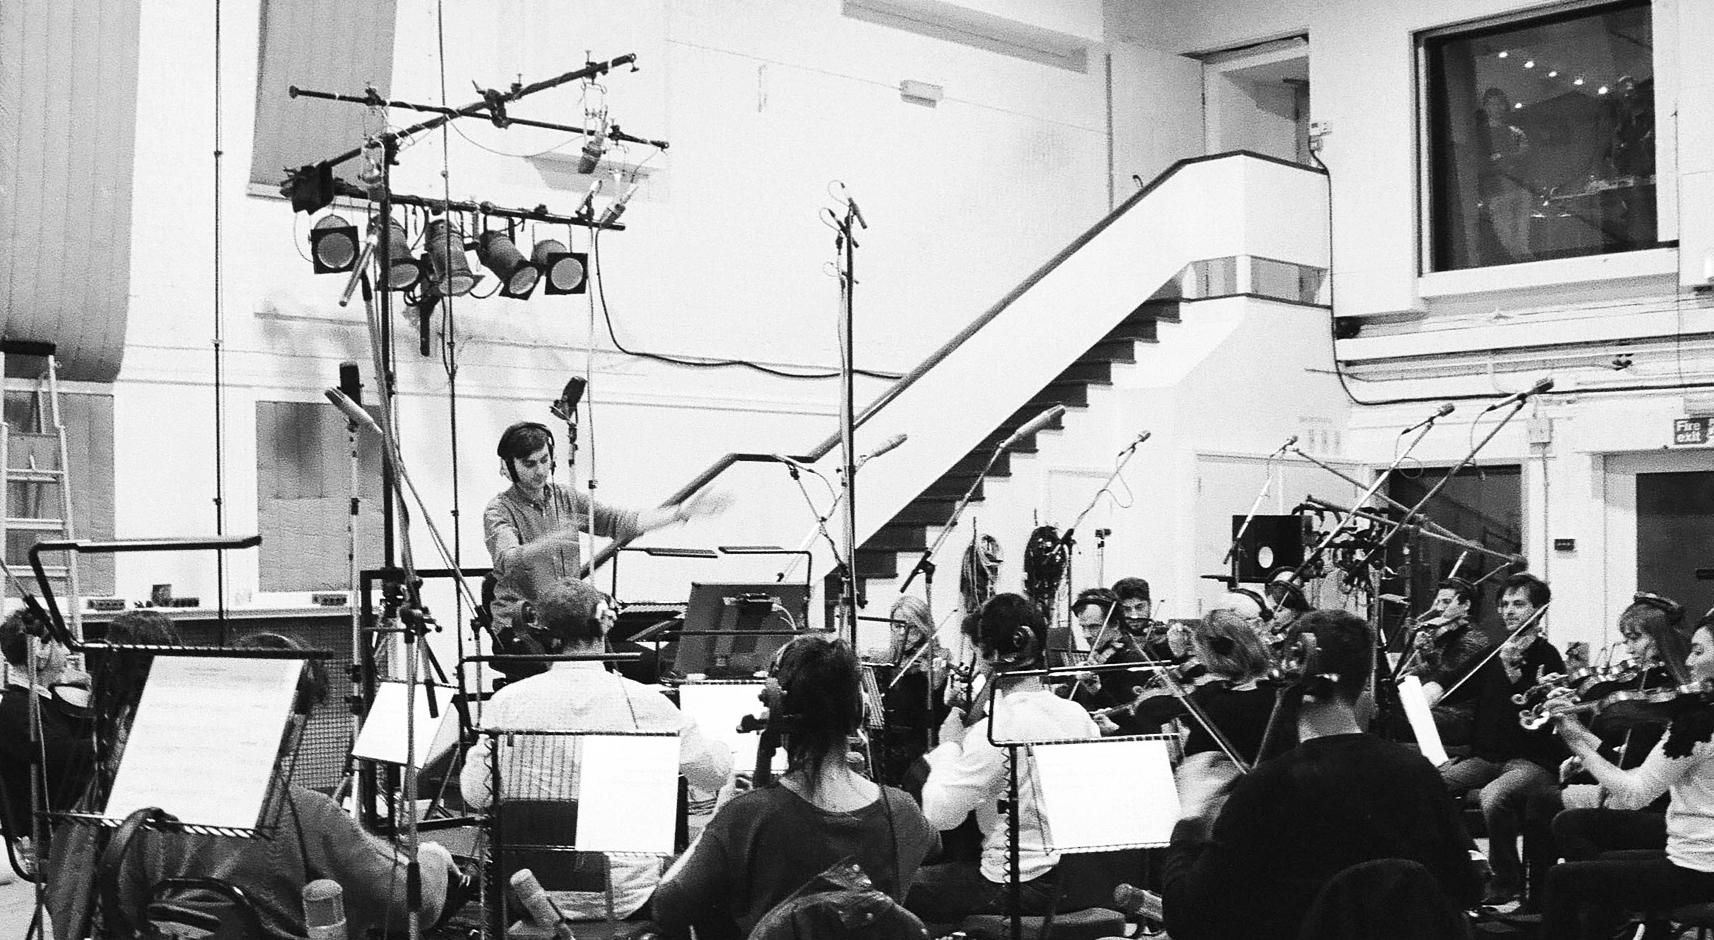 Abbey Road Studios,photo by Yuki Monestere